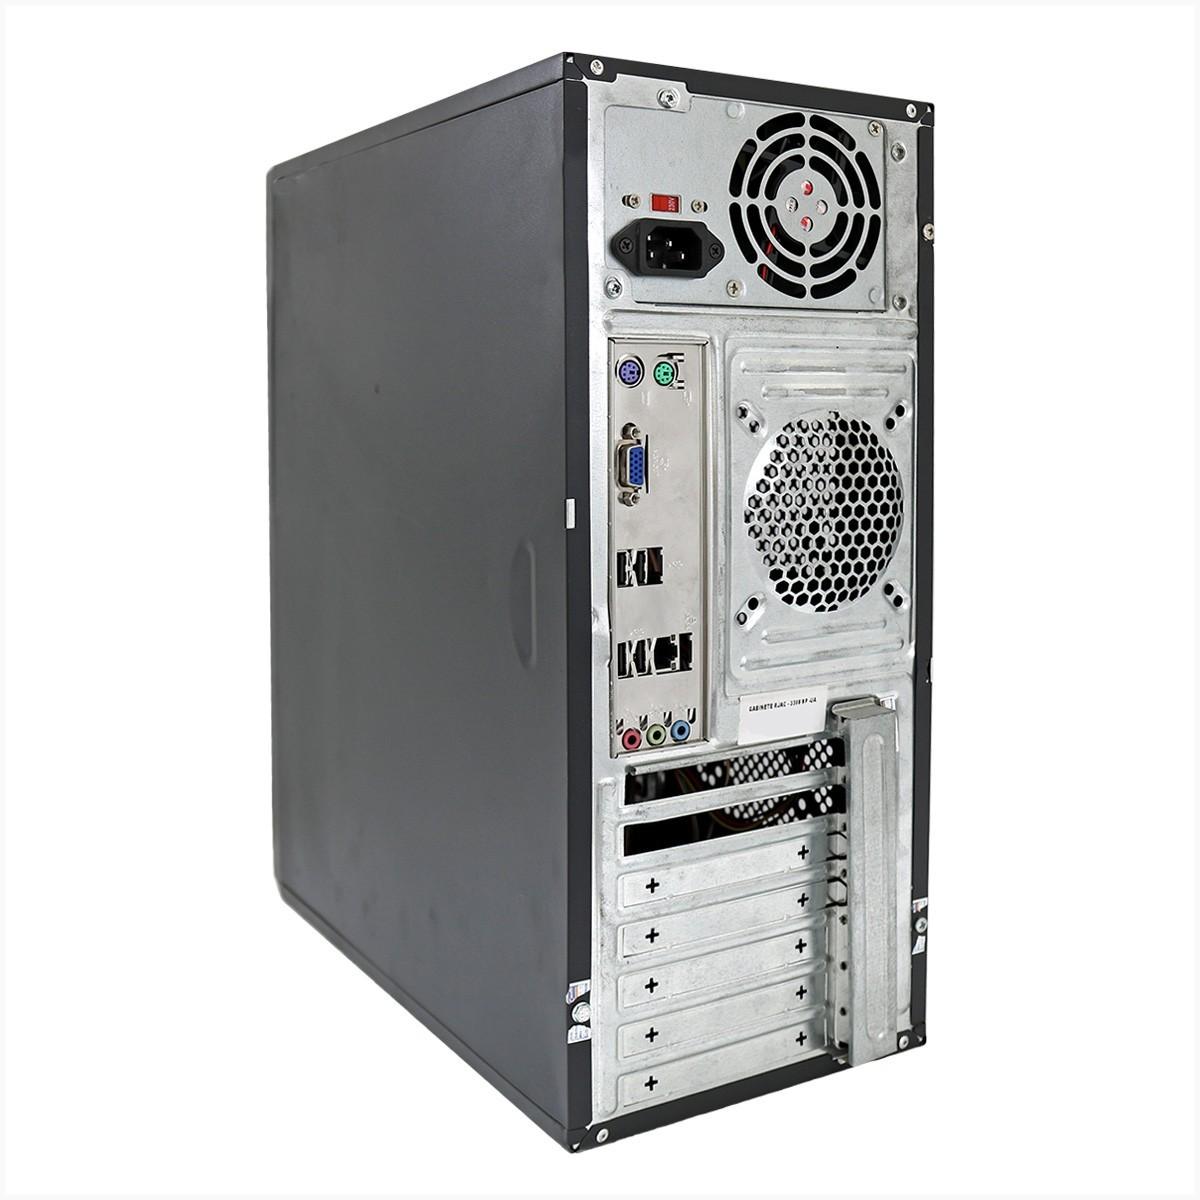 Desktop asus p8h61mlx3 i3 4gb 250gb - usado